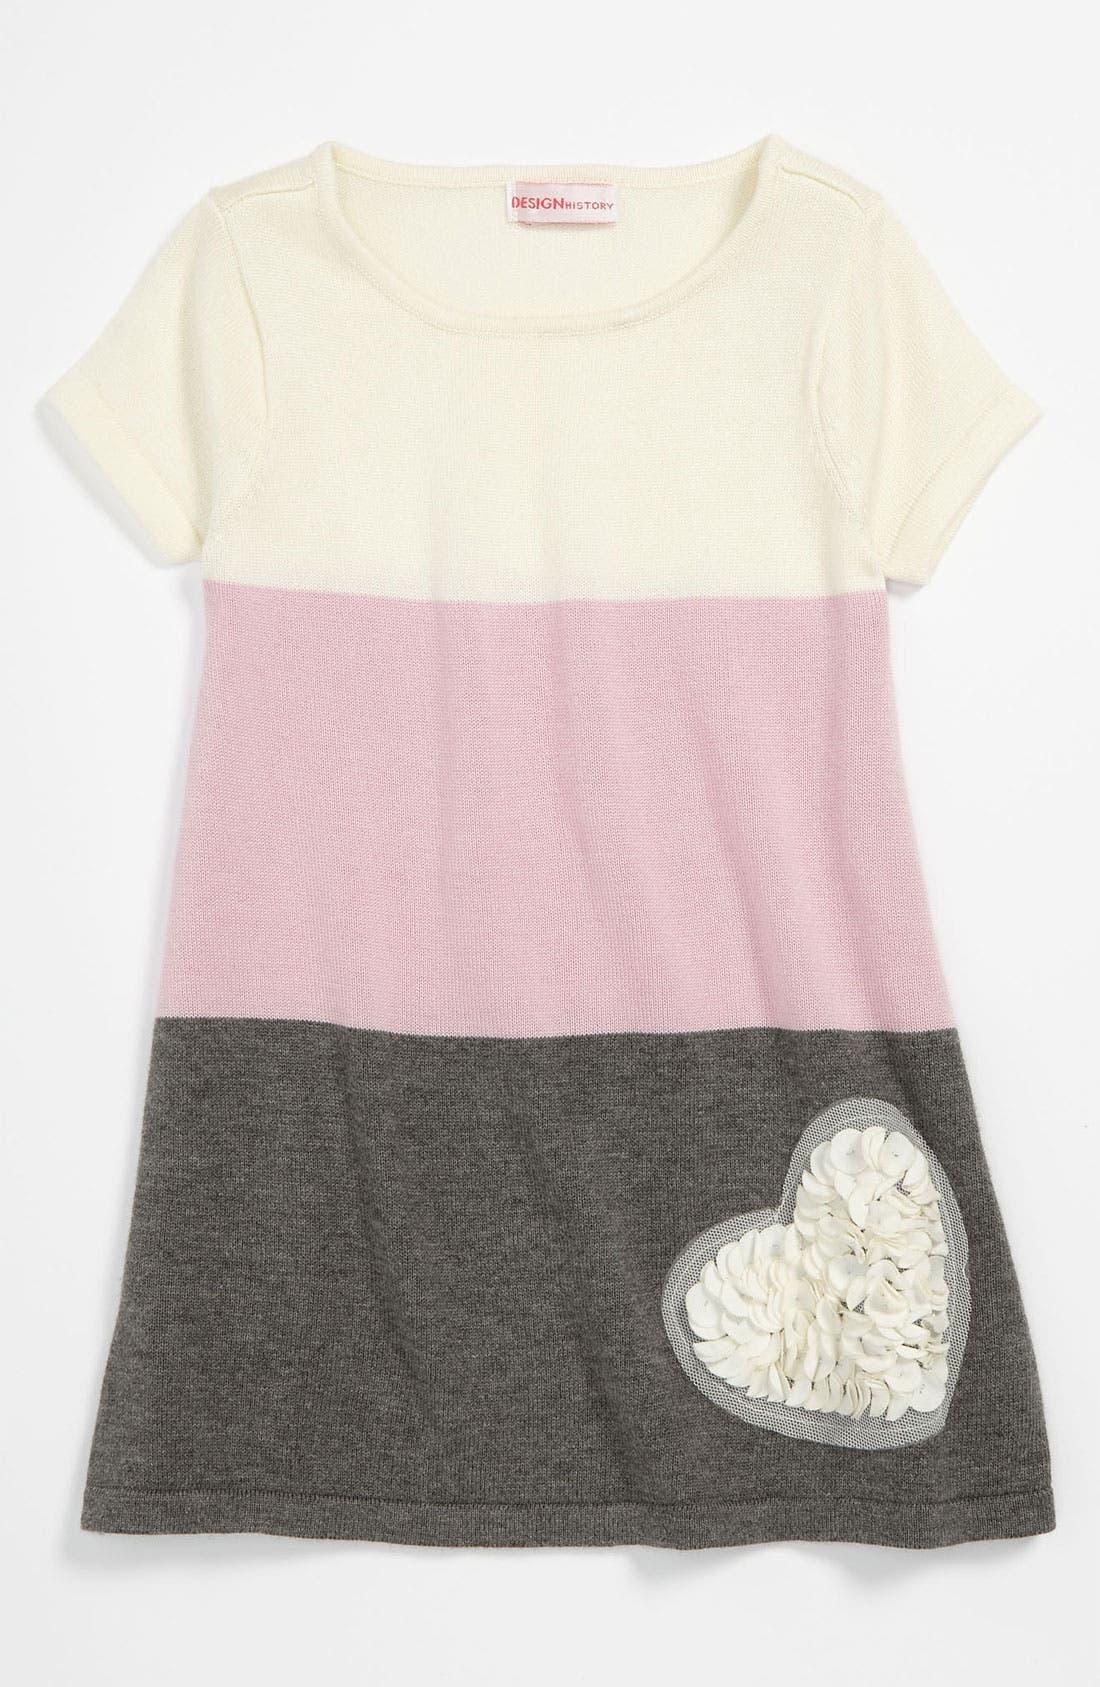 Alternate Image 1 Selected - Design History Sweater Dress (Toddler)